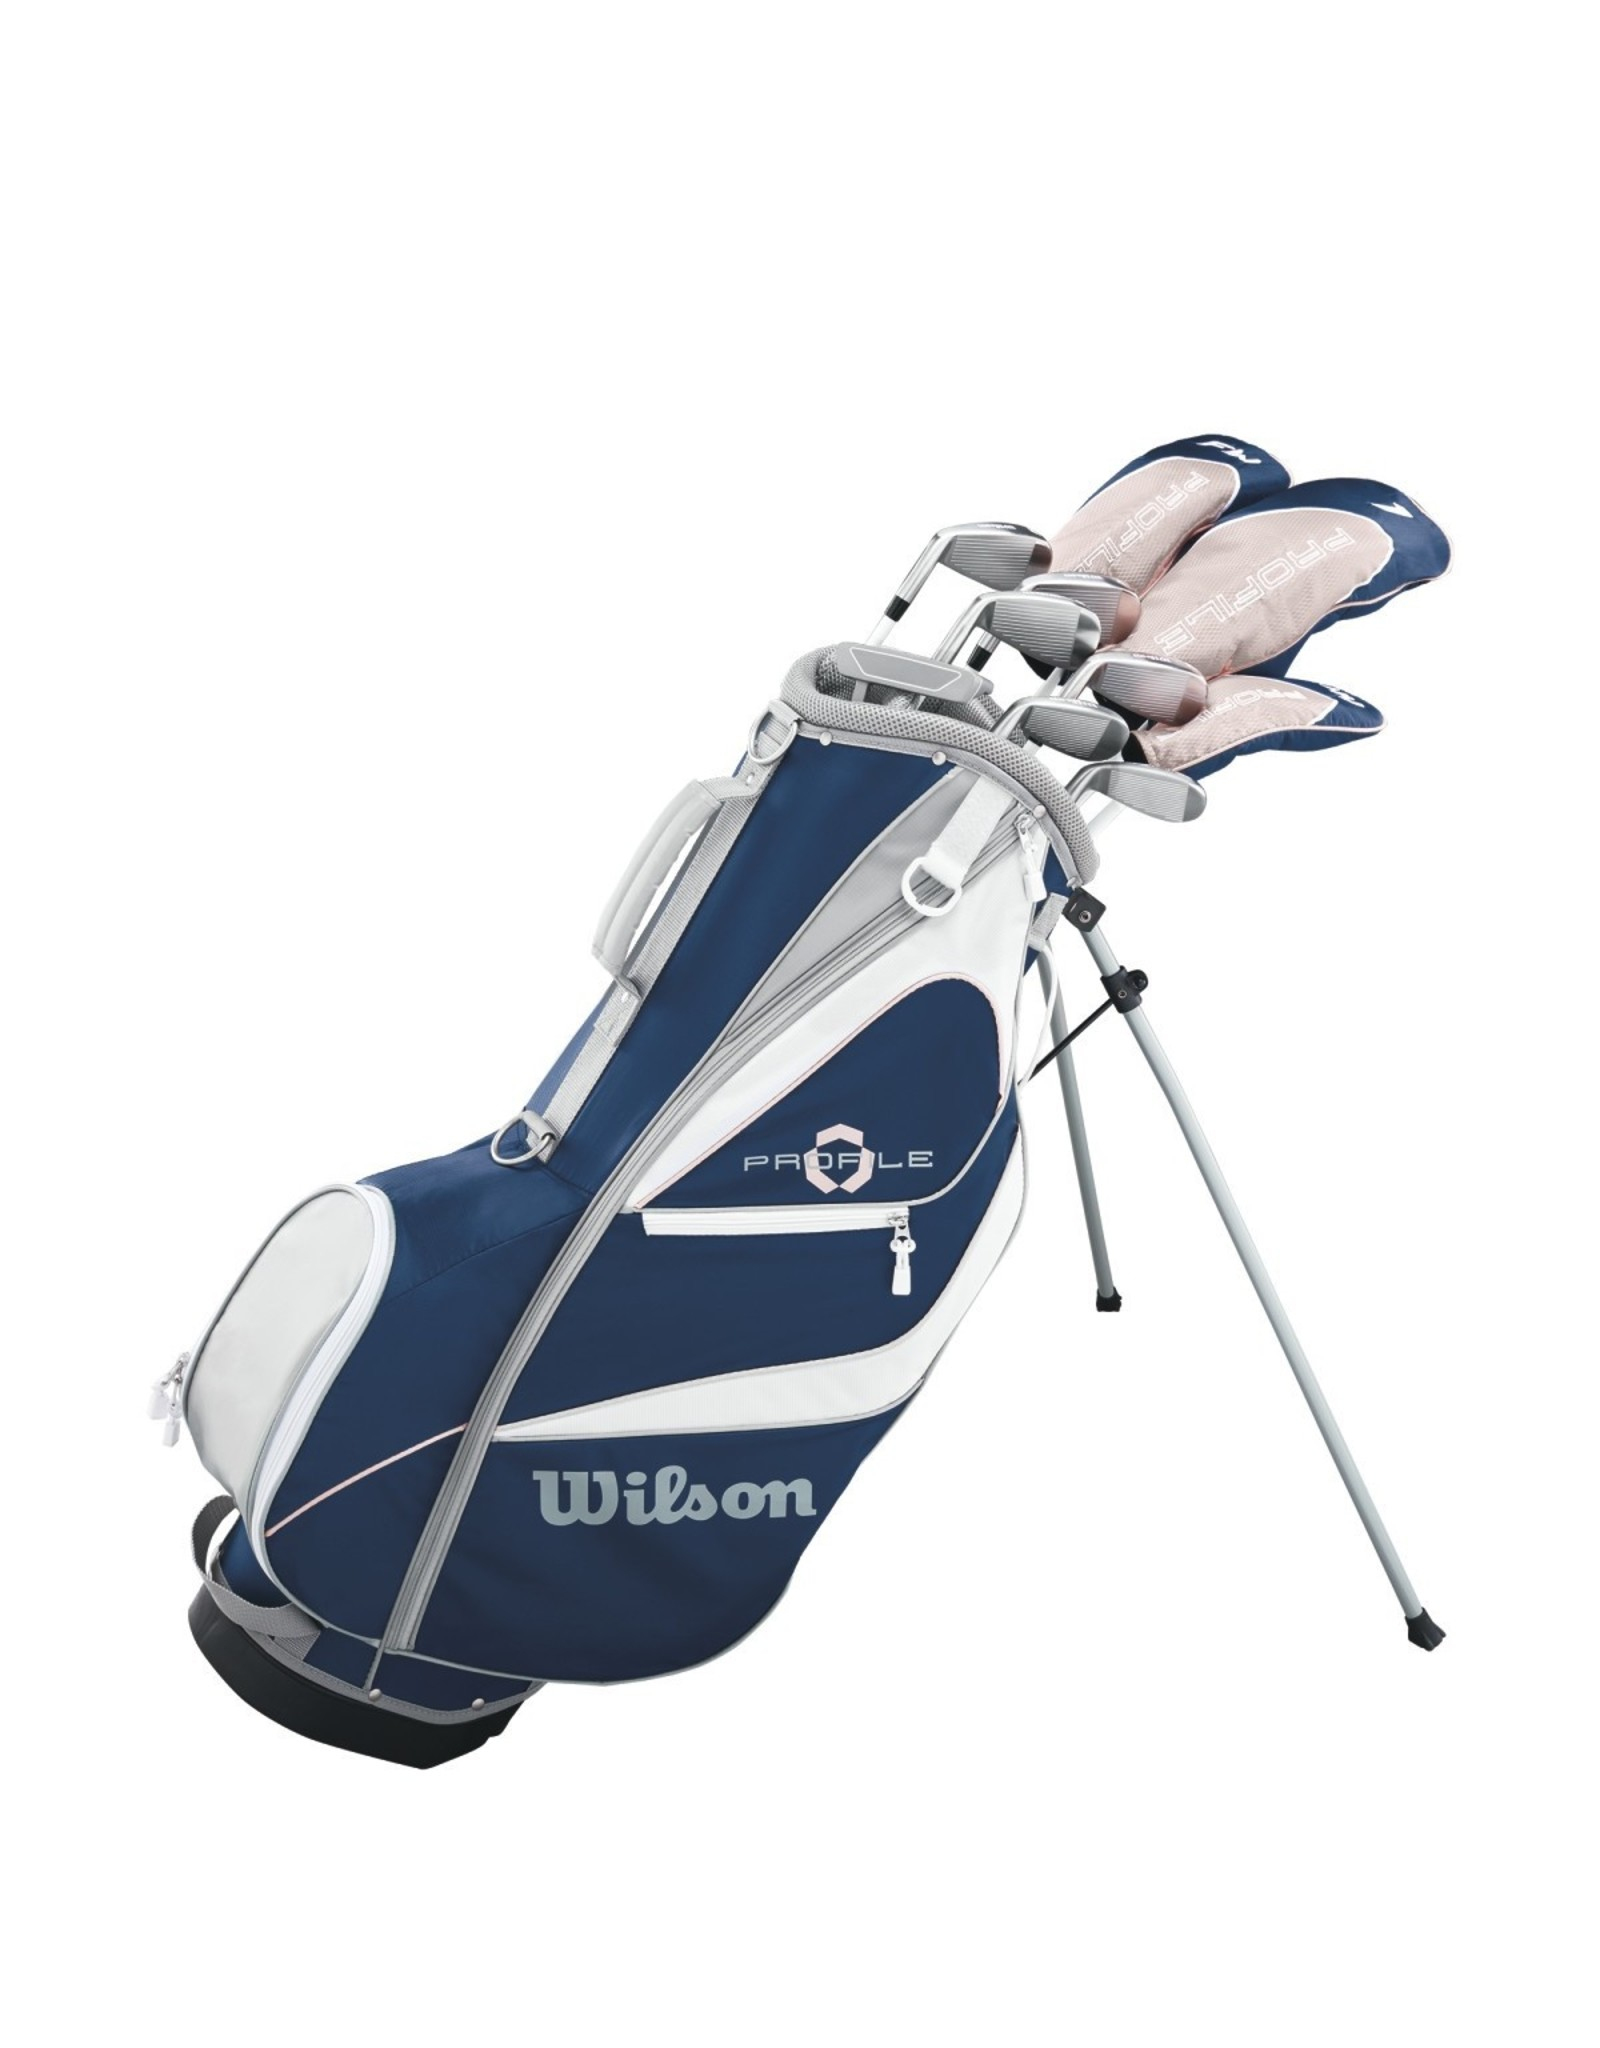 Wilson Wilson Profile XD Women's Package Set